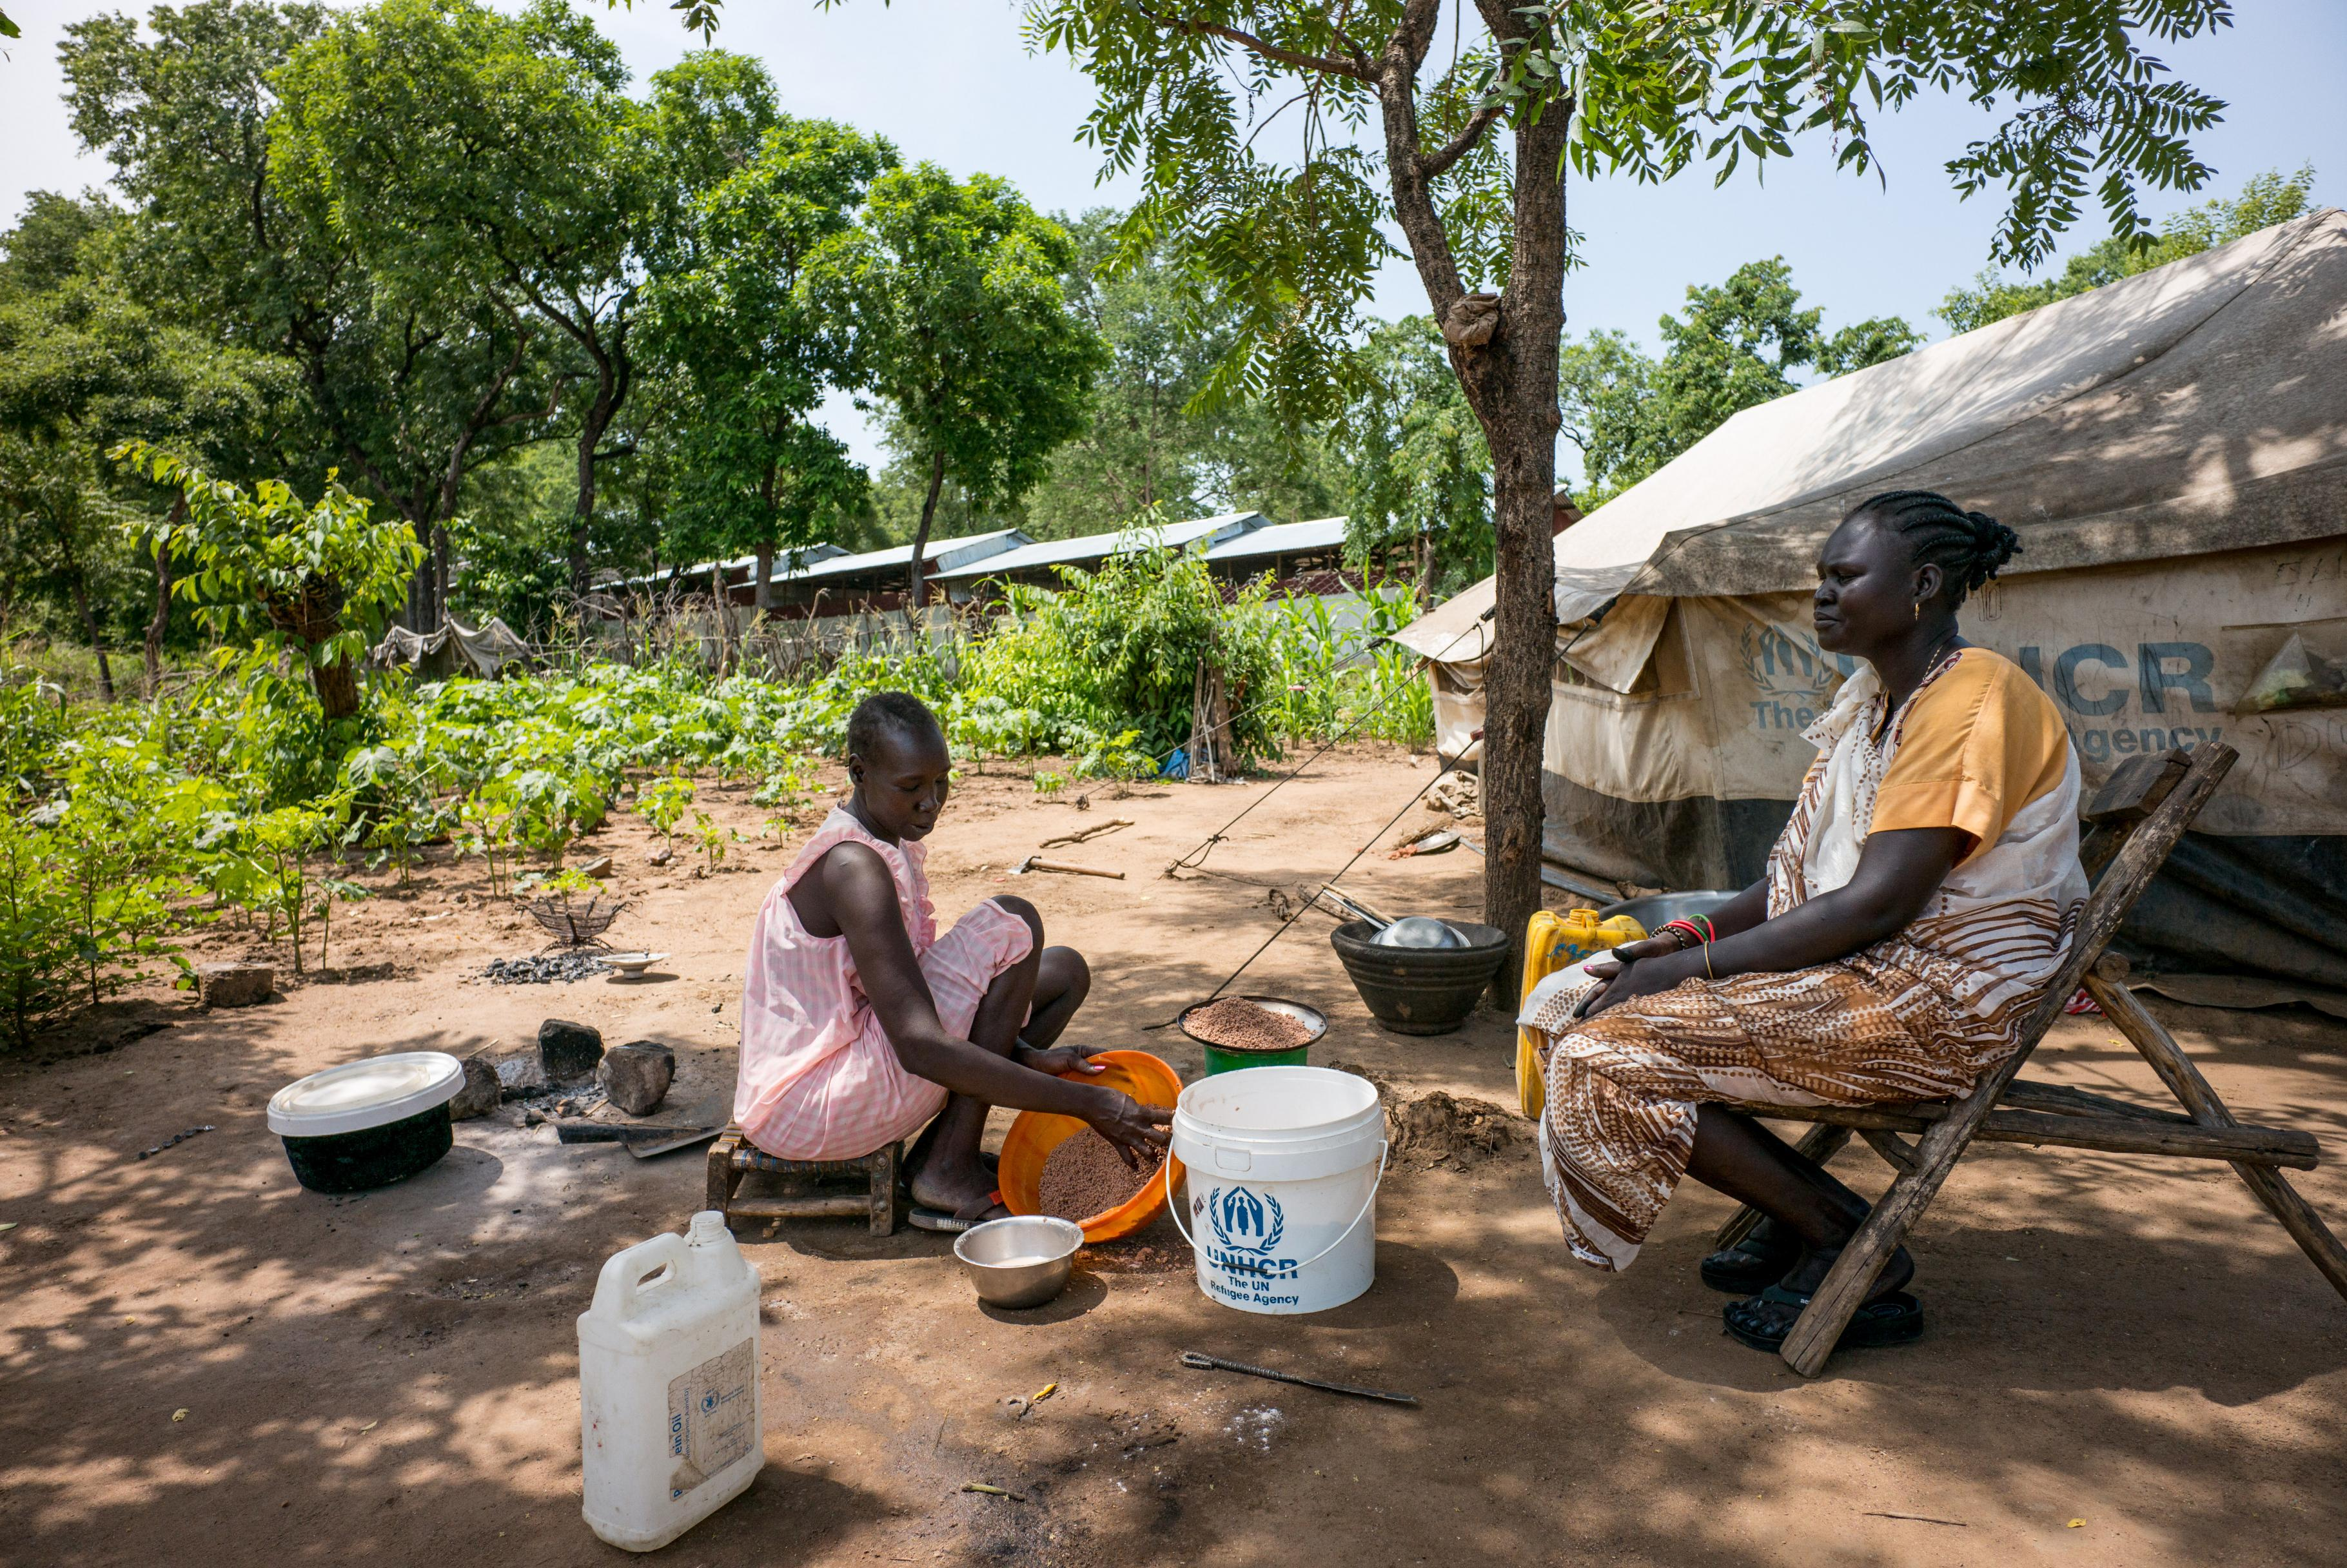 Nya aus dem Südsudan im Flüchtlingscamp in Jewi